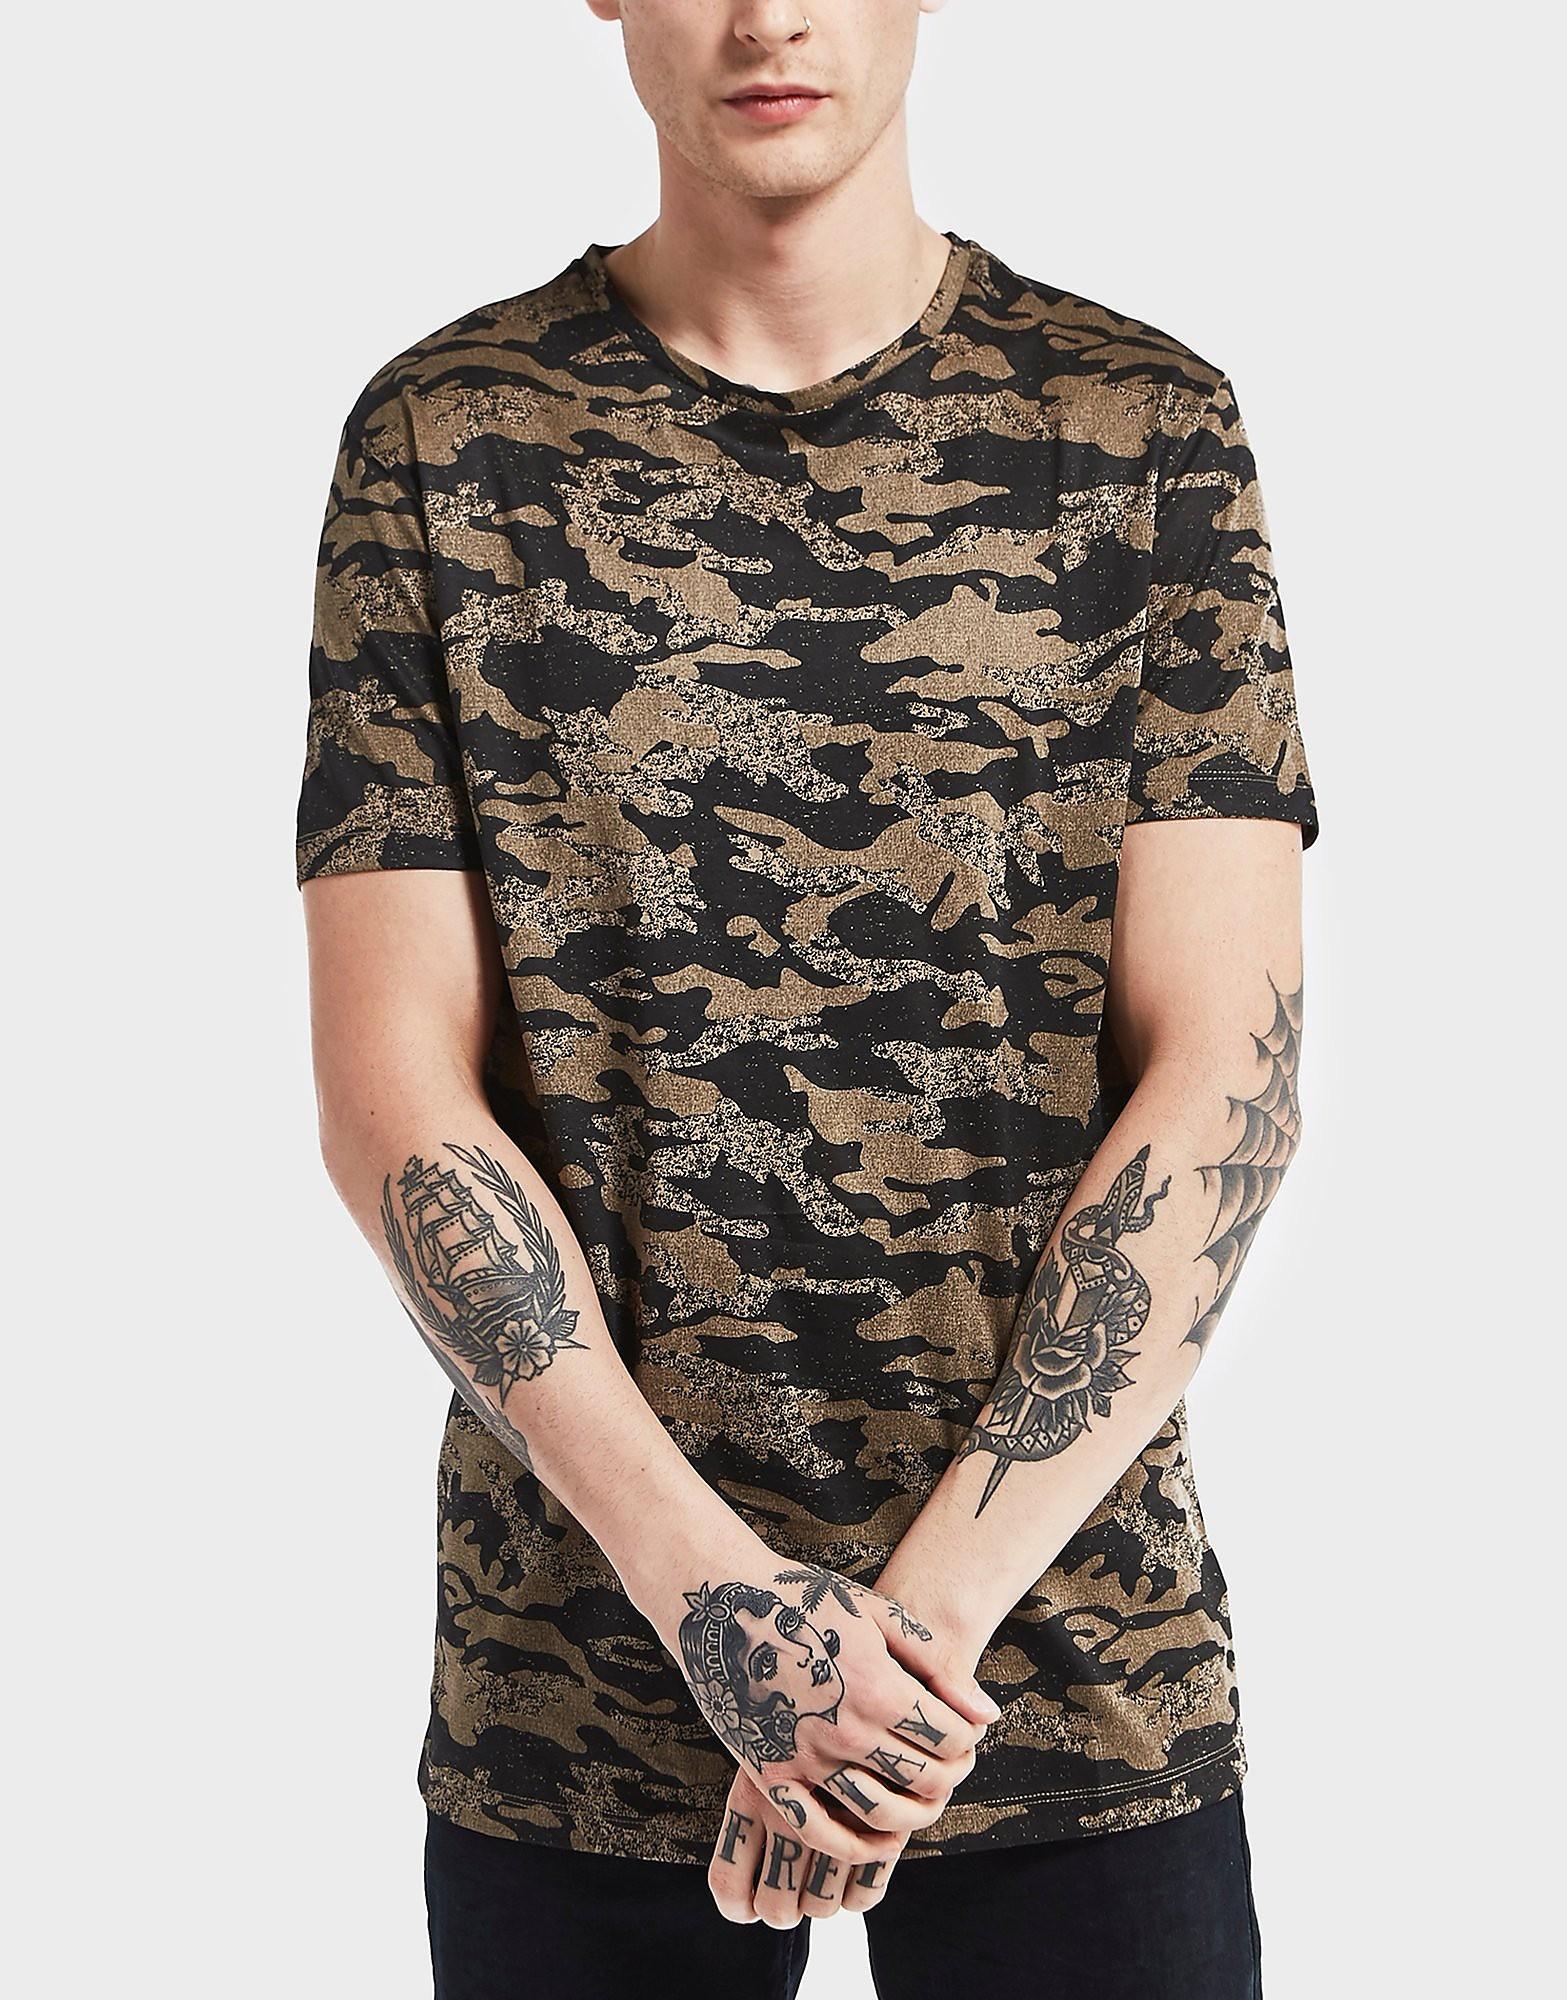 Antony Morato Camoflauge Short Sleeve T-Shirt